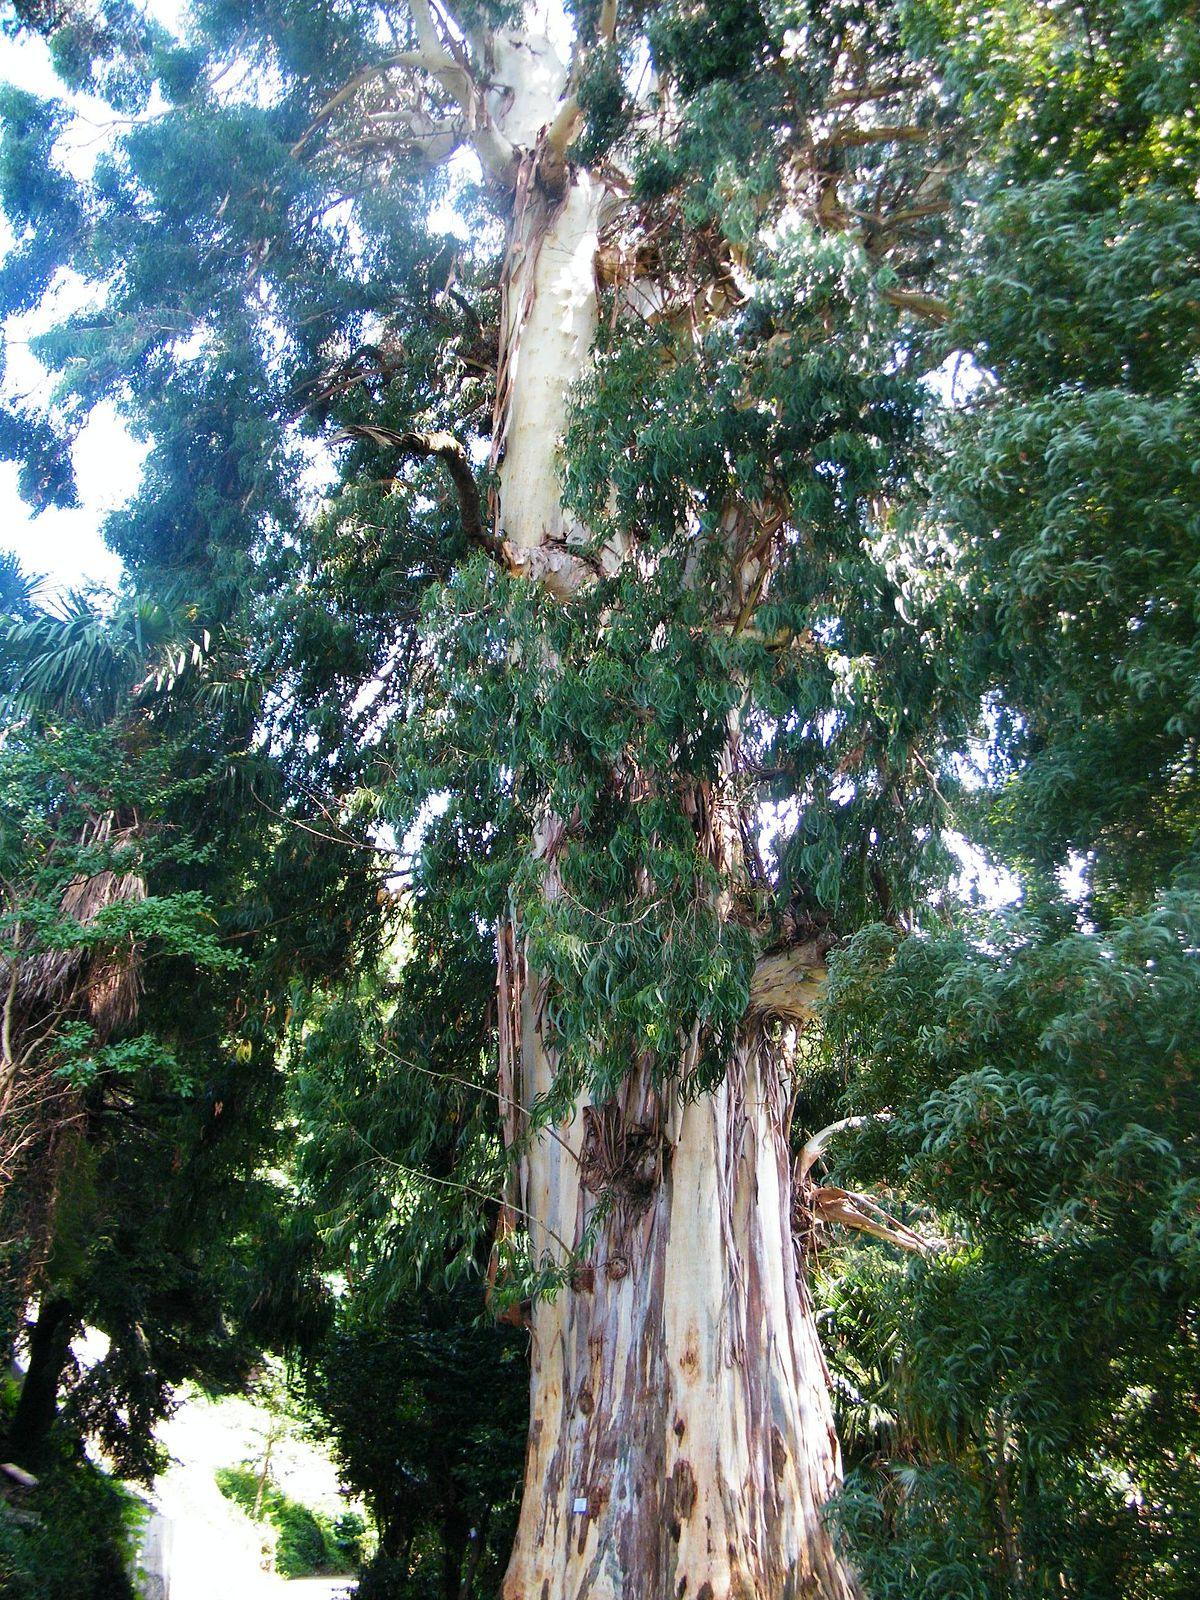 7582 ЕВКАЛІПТА НАСТОЙКА - Eucalyptus vitaminalis**